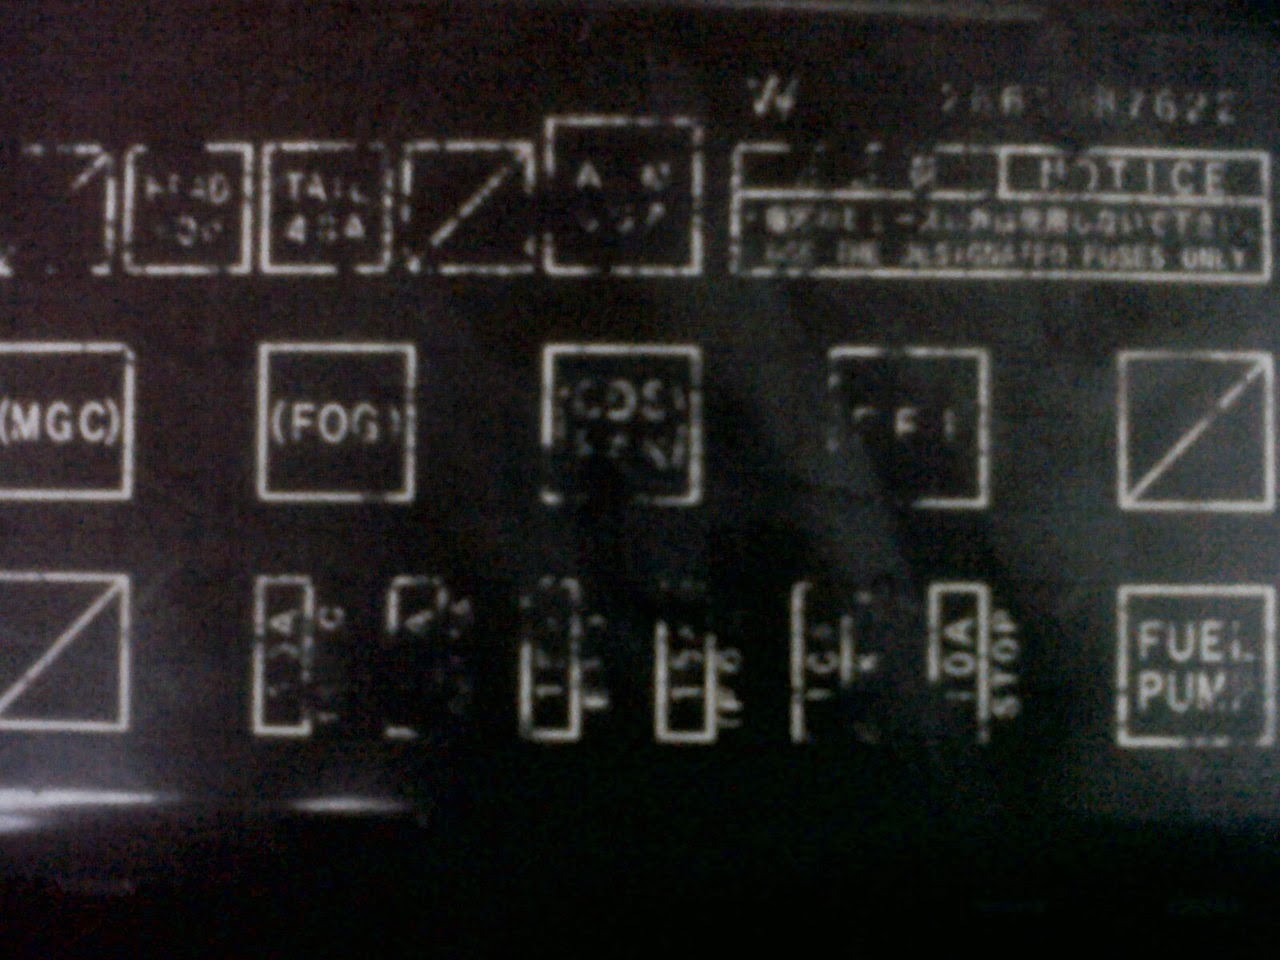 fuse box daihatsu taruna schematic diagramfuse box daihatsu taruna wiring diagram daihatsu wagon r fuse box [ 1280 x 960 Pixel ]